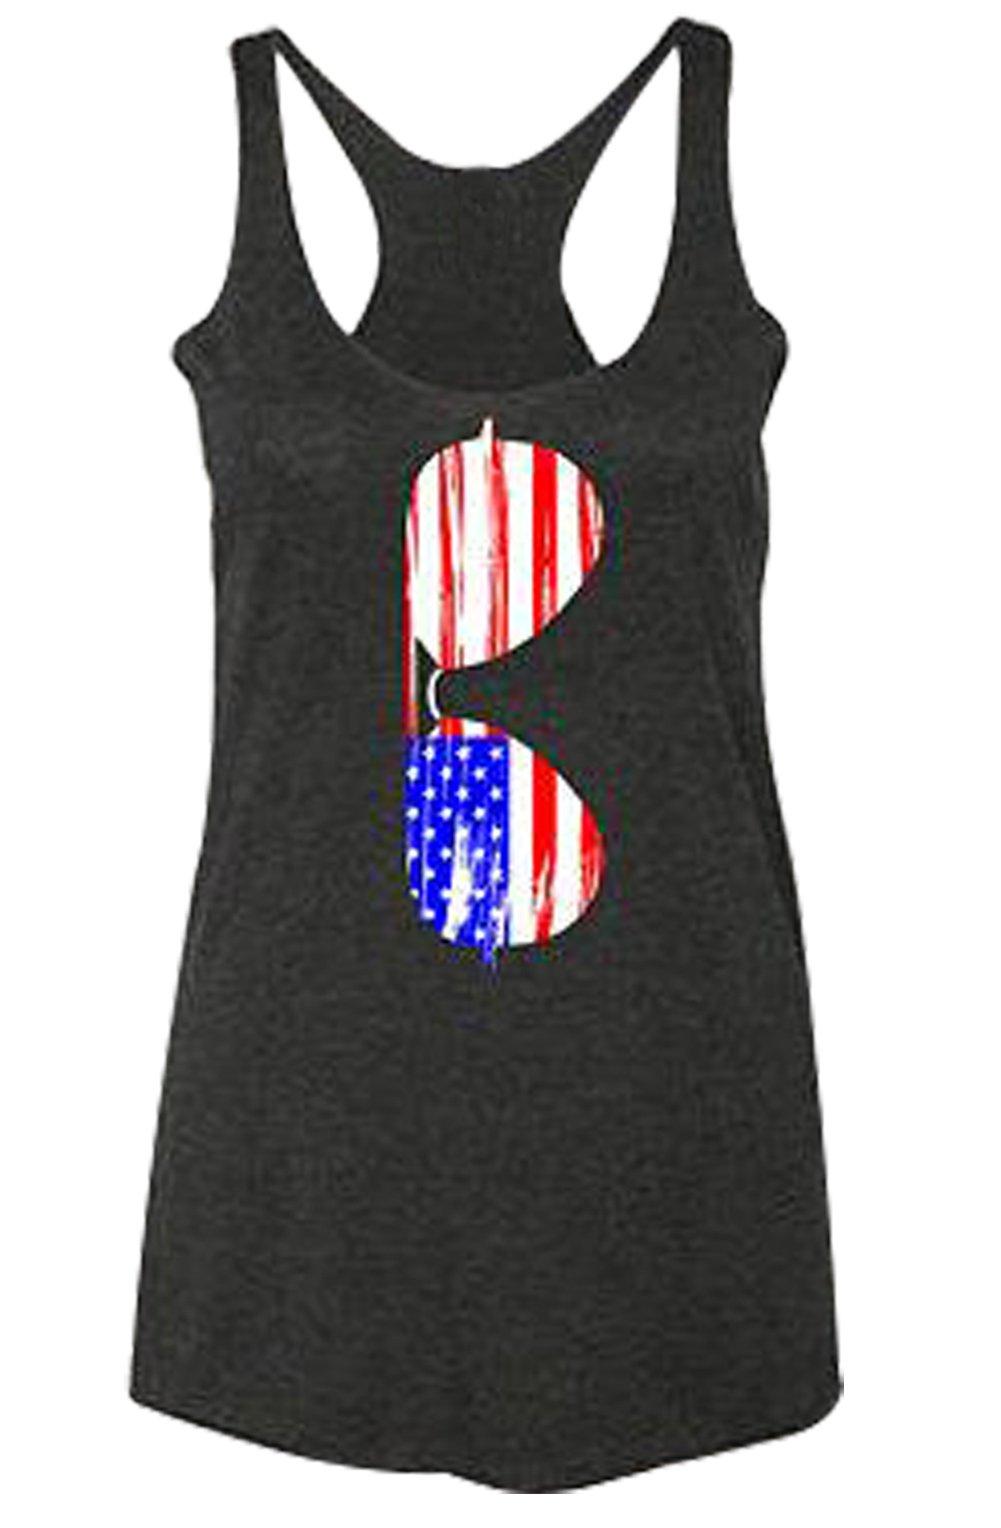 FAYALEQ American Flag Sunglasses Racerback Tank Tops Women's Sleeveless Shirt Tee Blouse Size XL (Black)